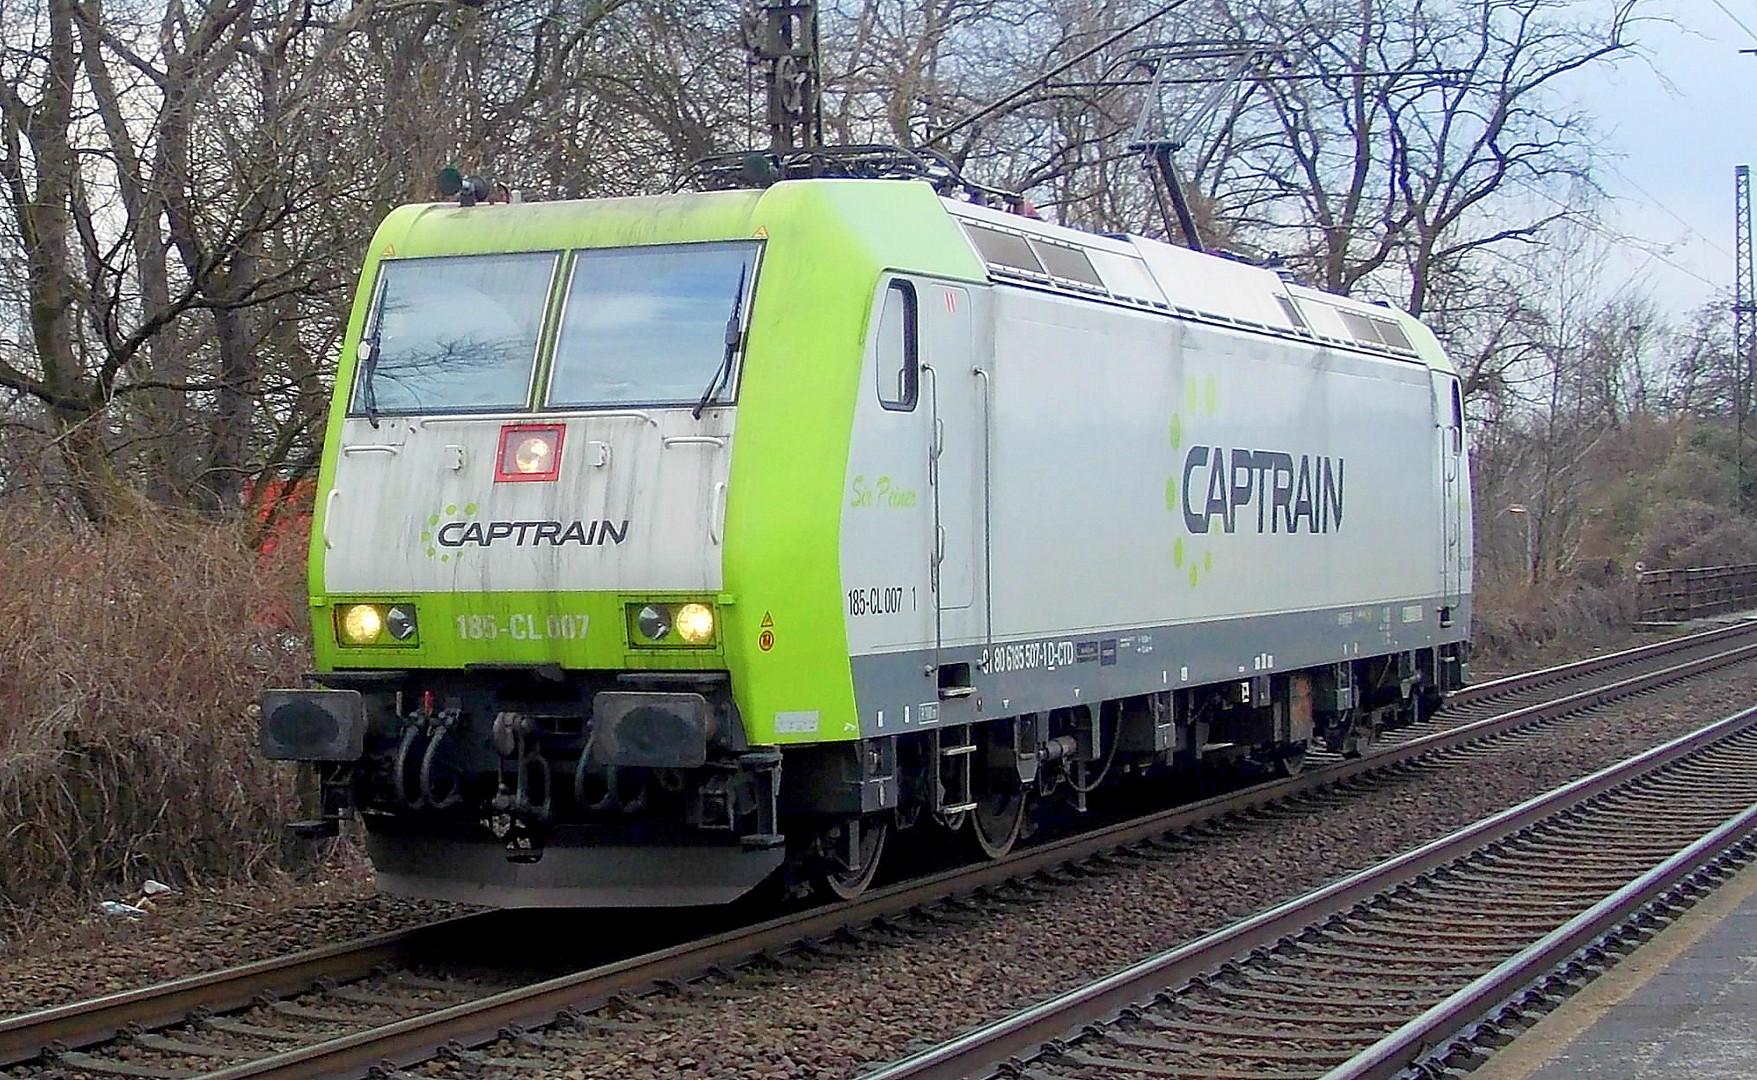 Captrain